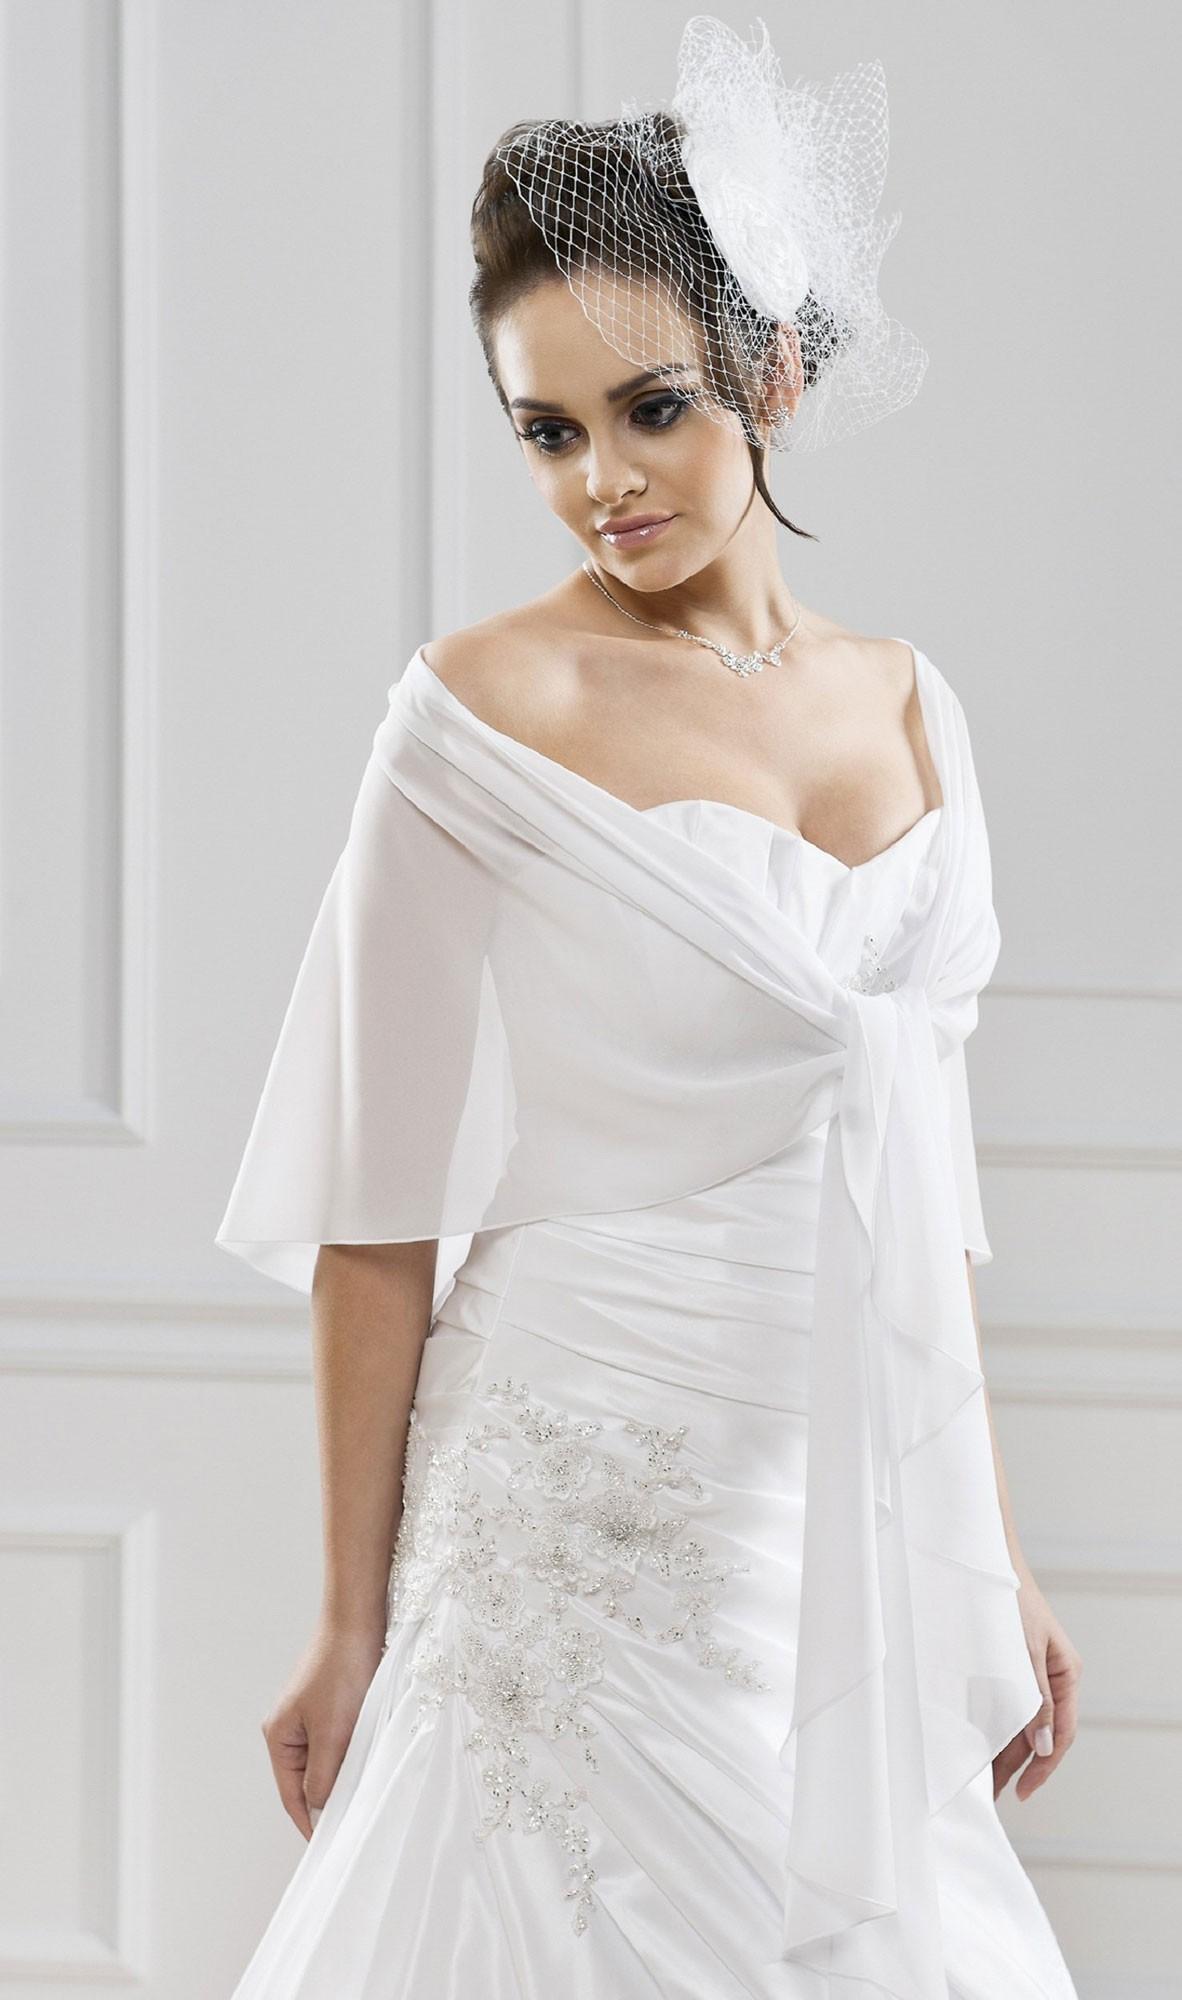 Chale blanc mariage - Etole mariage hiver ...